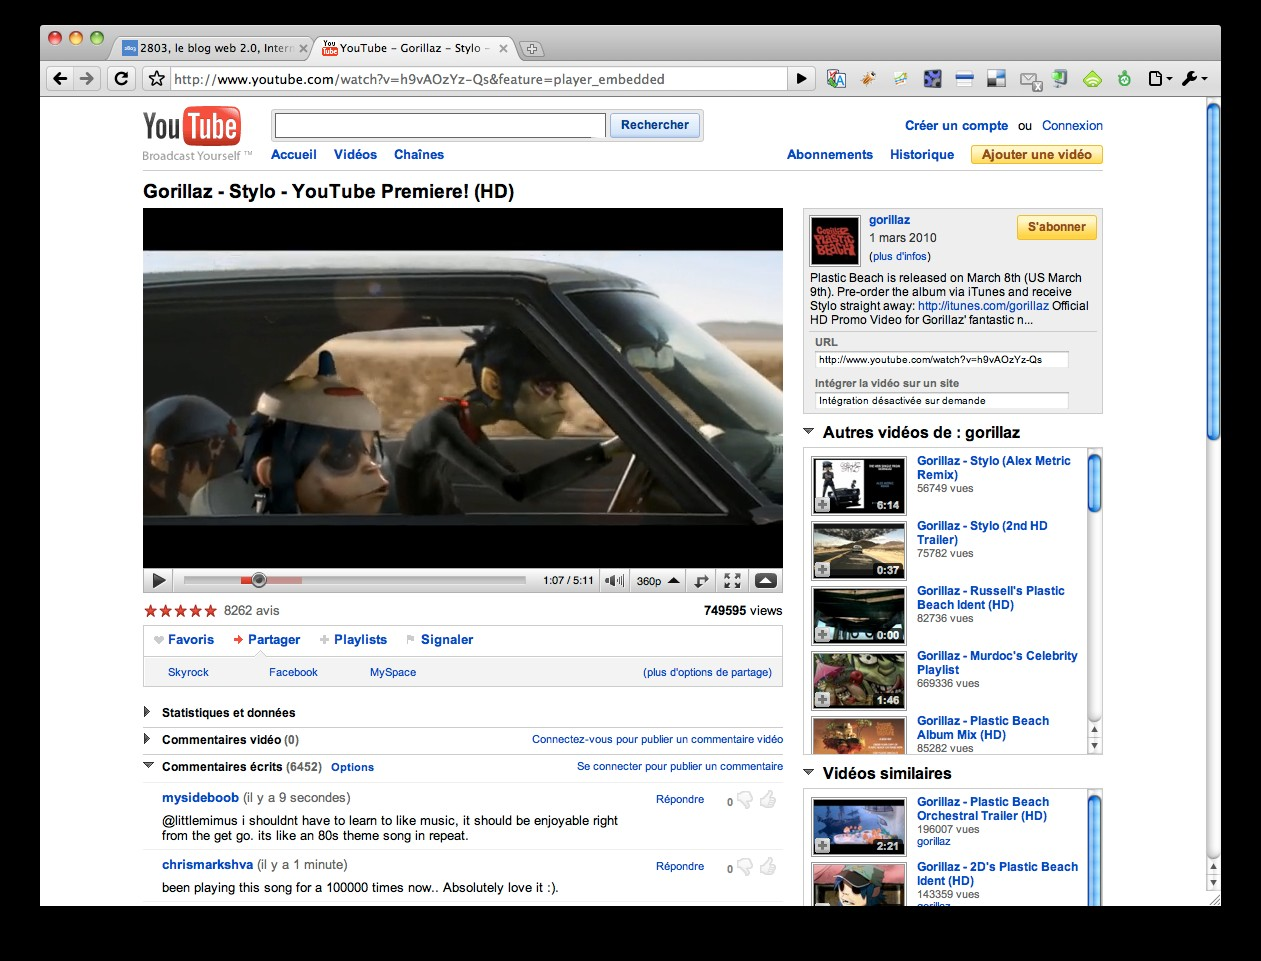 youtube-gorrilaz